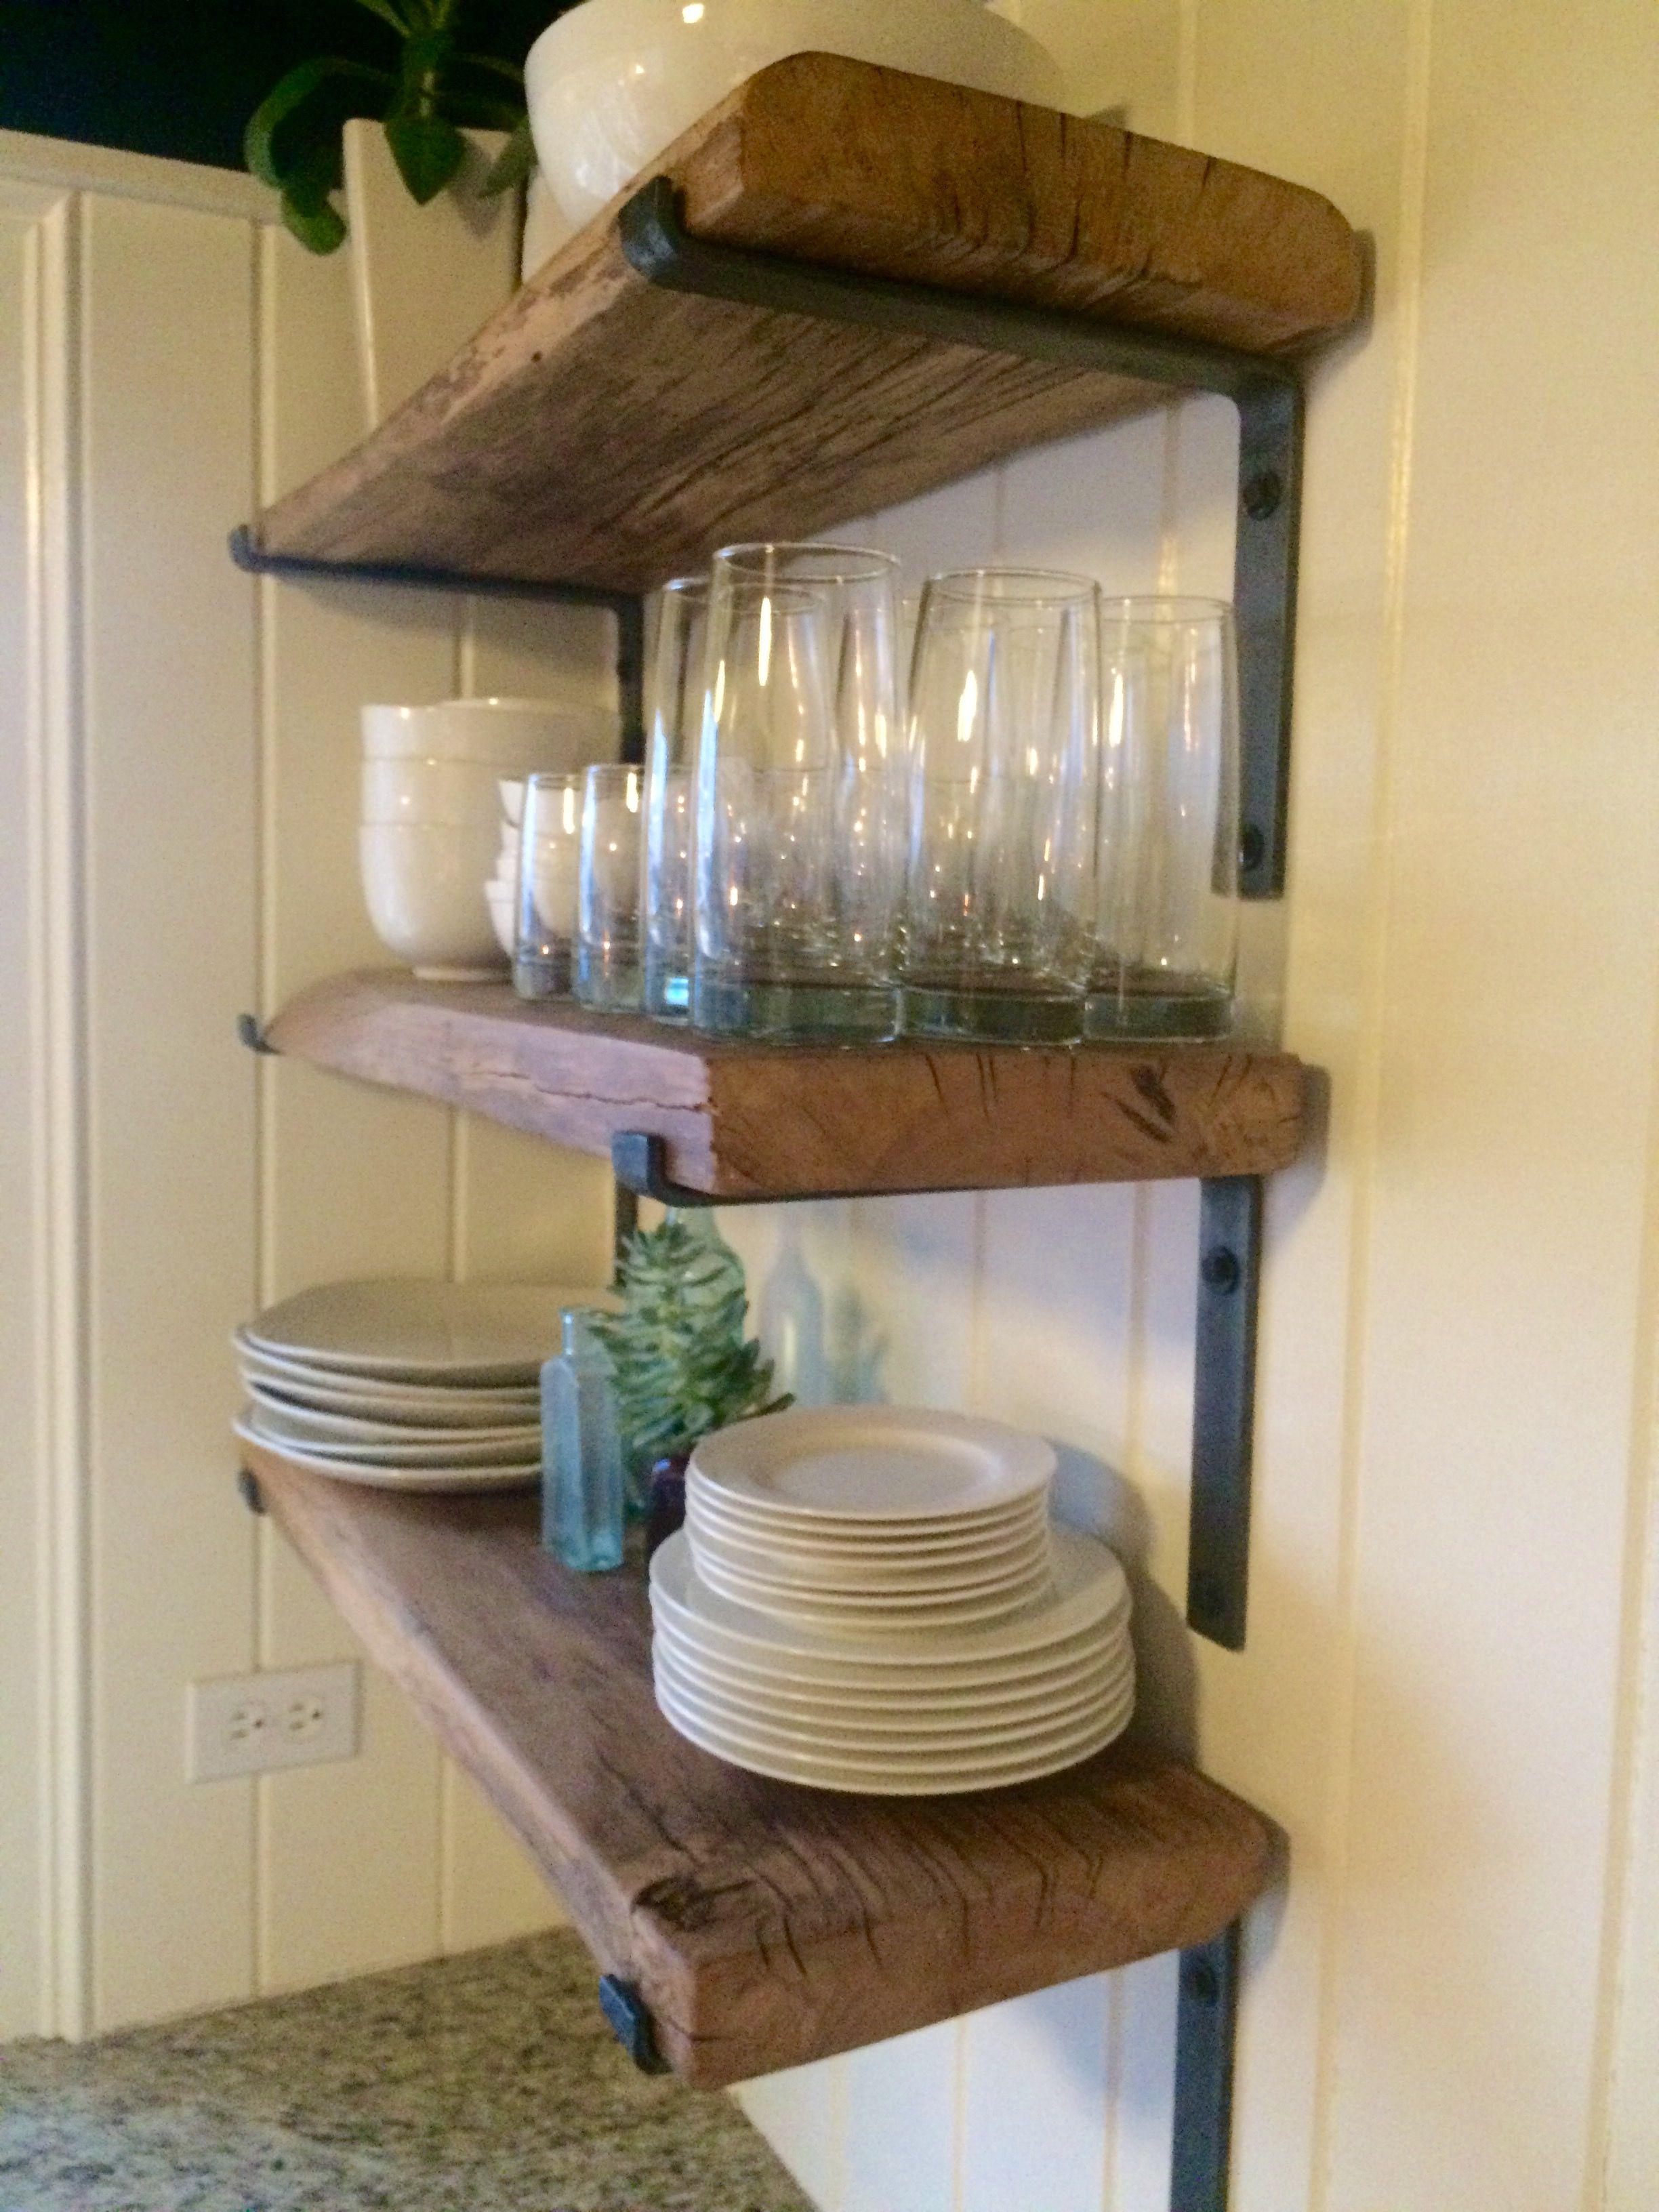 Reclaimed Shelves With Hand Made Brackets Floating Shelves